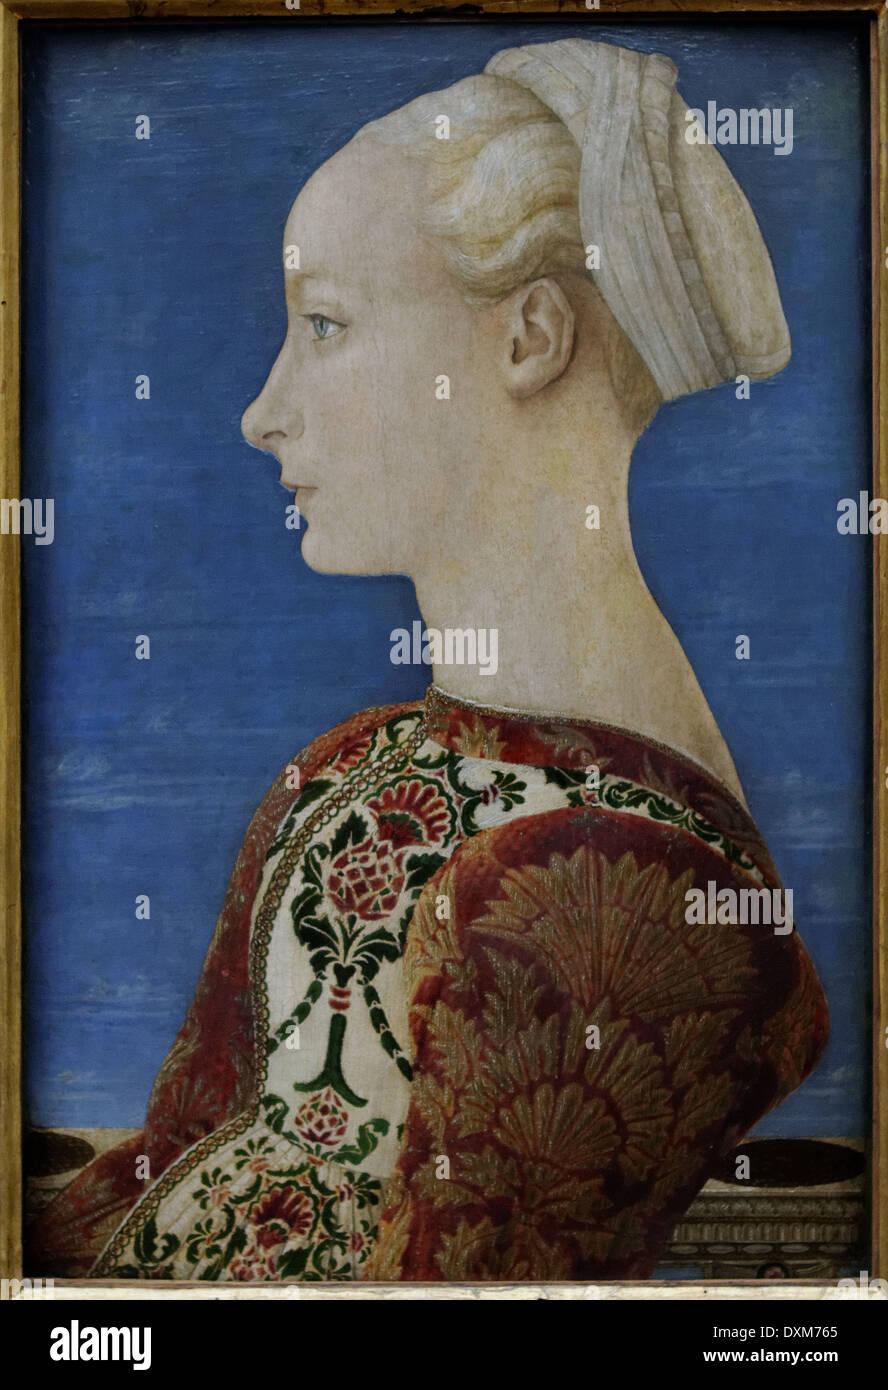 Piero del Pollaiuolo - Young Woman Profile Portrait - 1465 - XV th Century - Italian School - Gemäldegalerie - Berlin - Stock Image